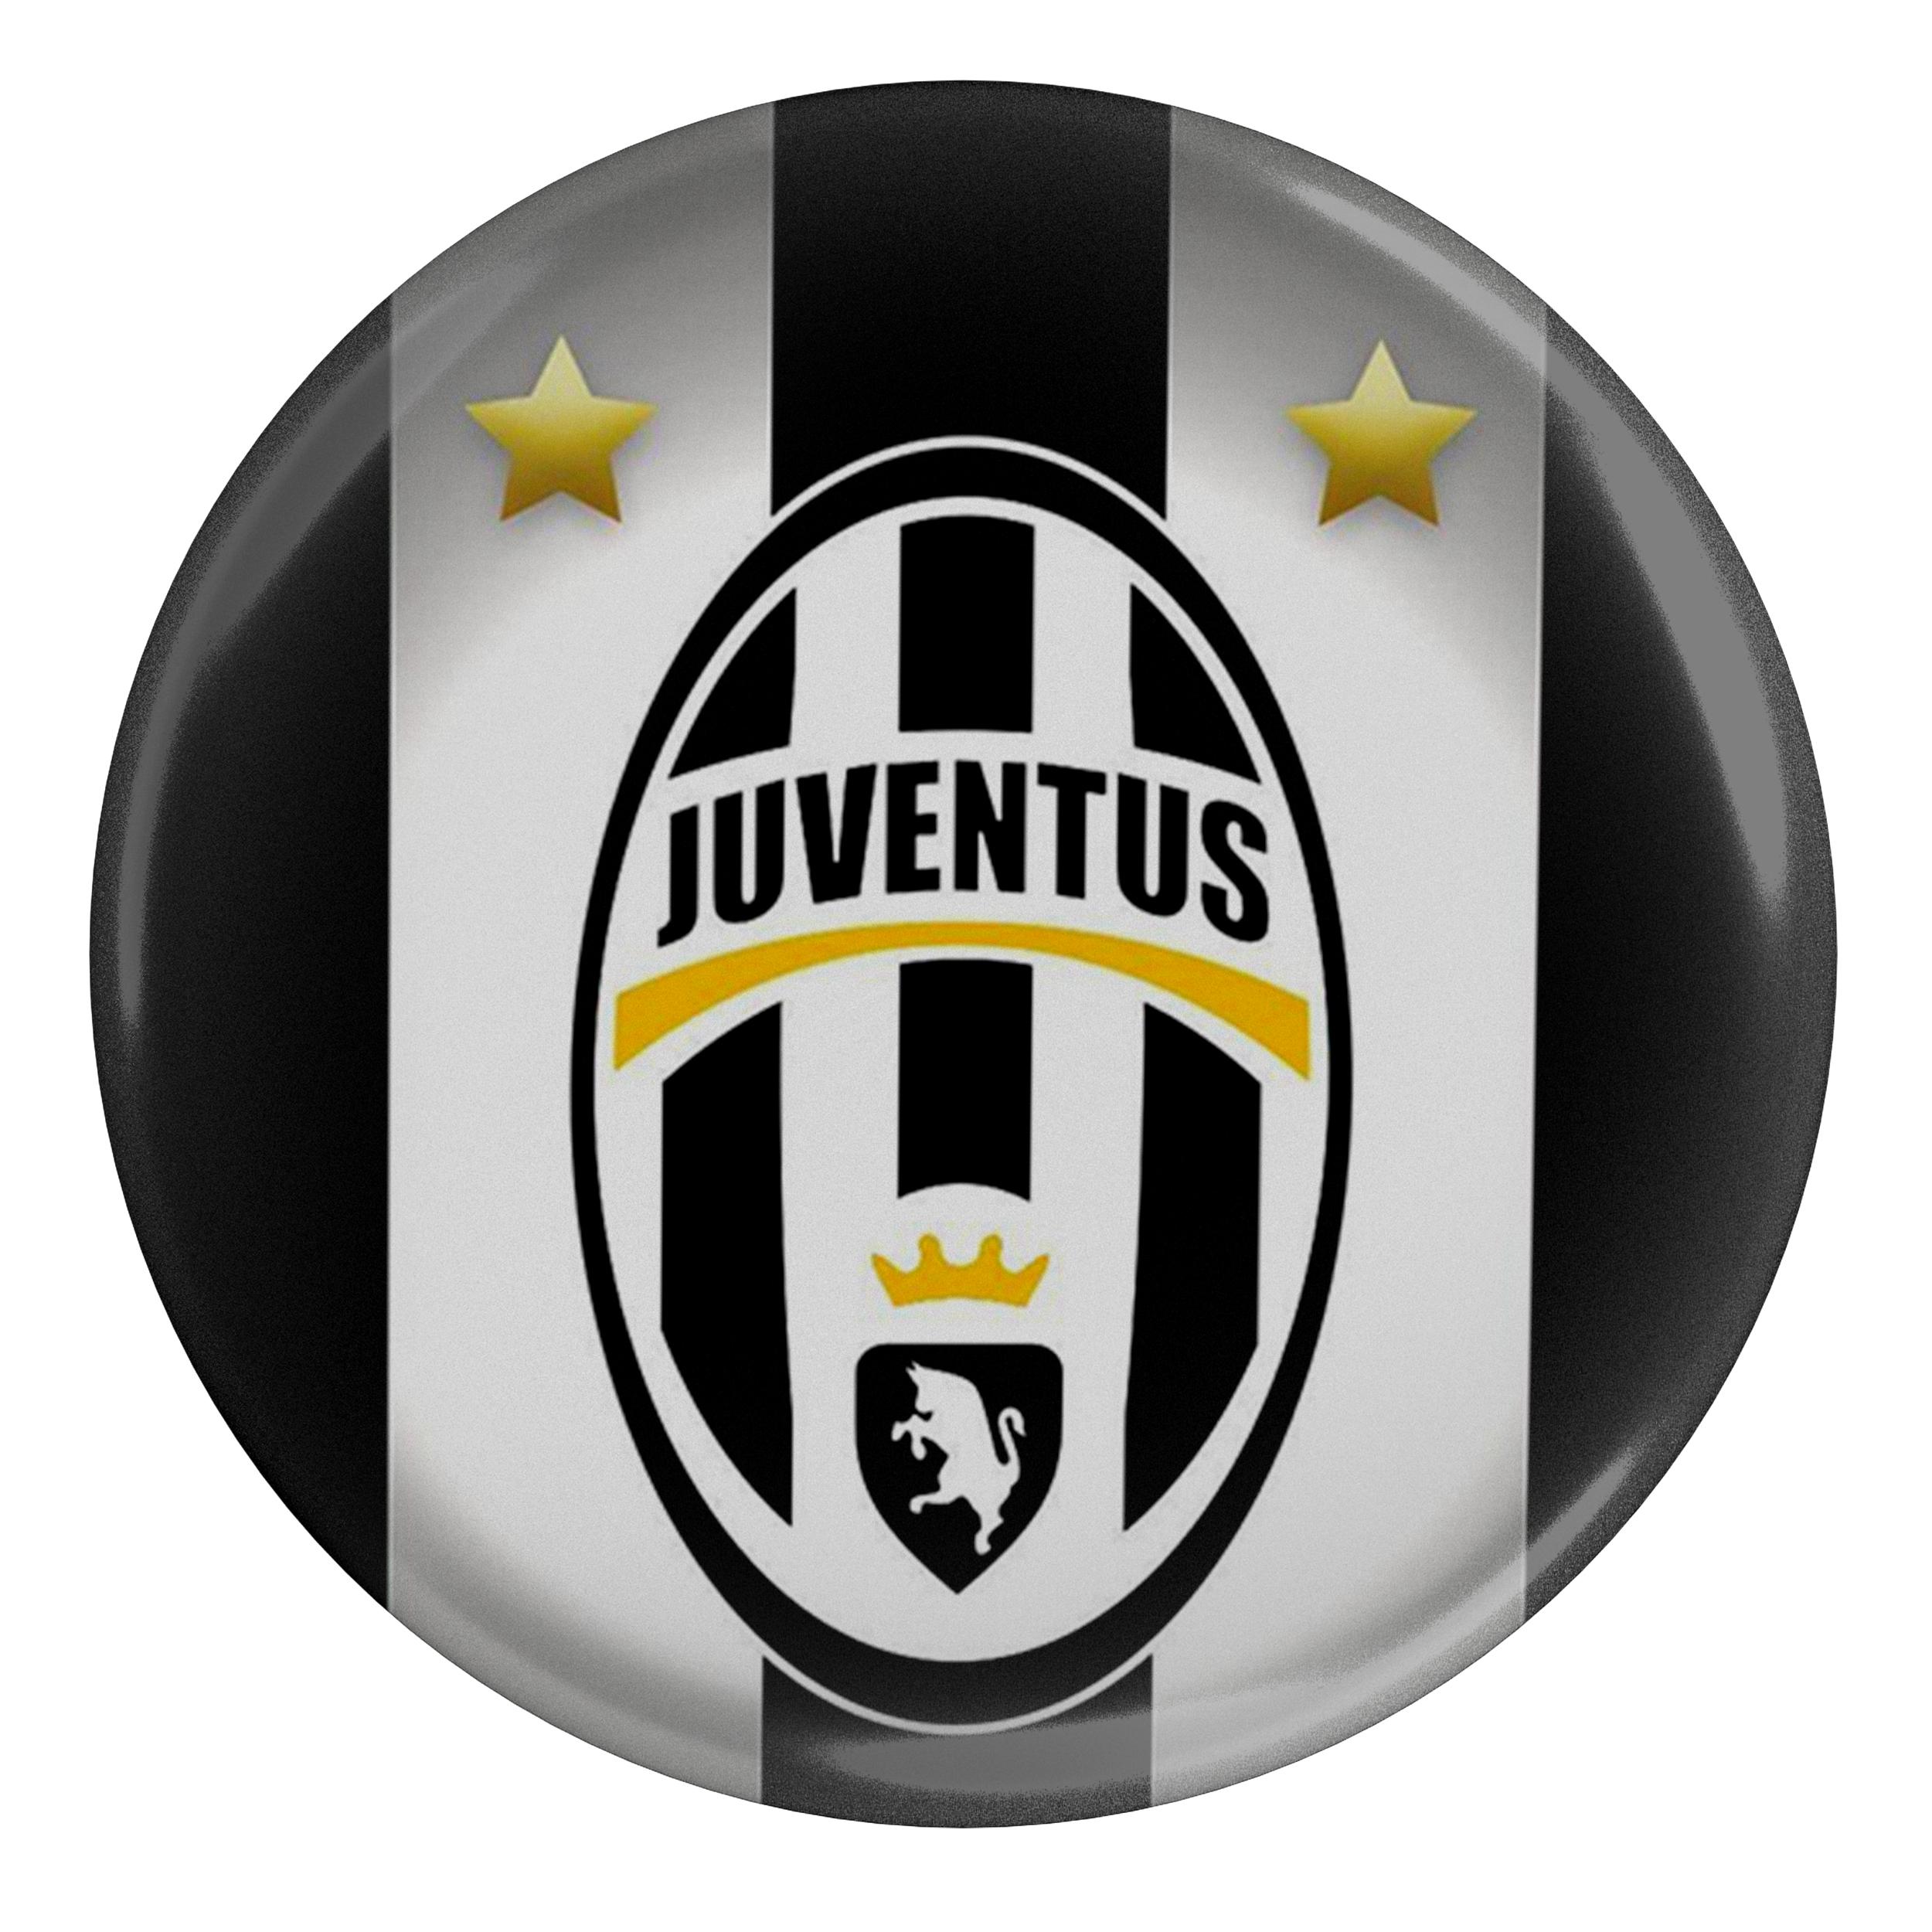 پیکسل طرح باشگاه فوتبال یوونتوس ایتالیا مدل S4111